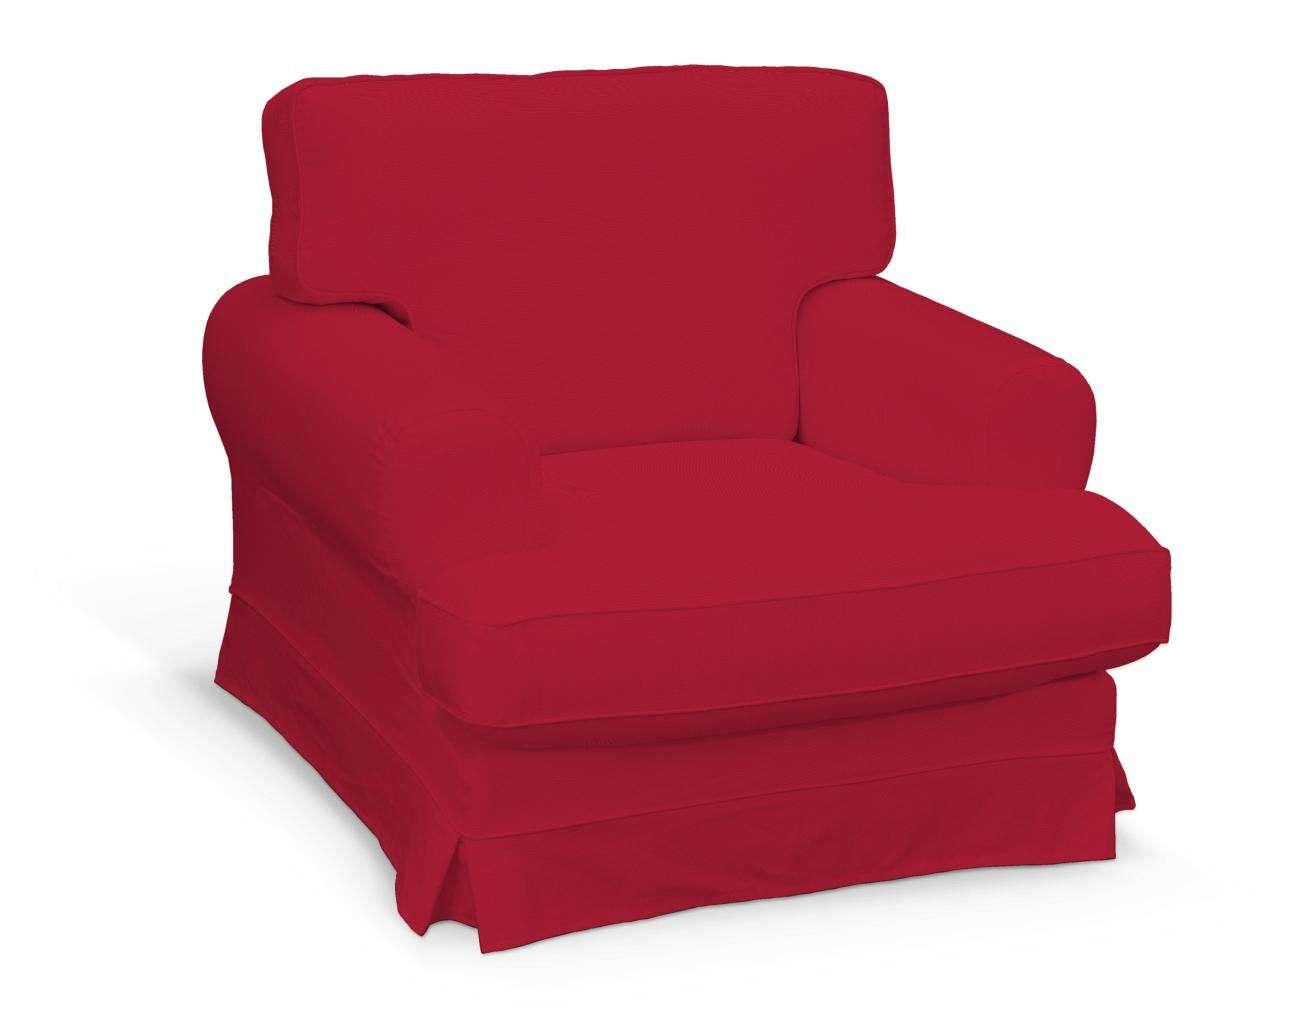 Ekeskog Sesselbezug von der Kollektion Cotton Panama, Stoff: 702-04